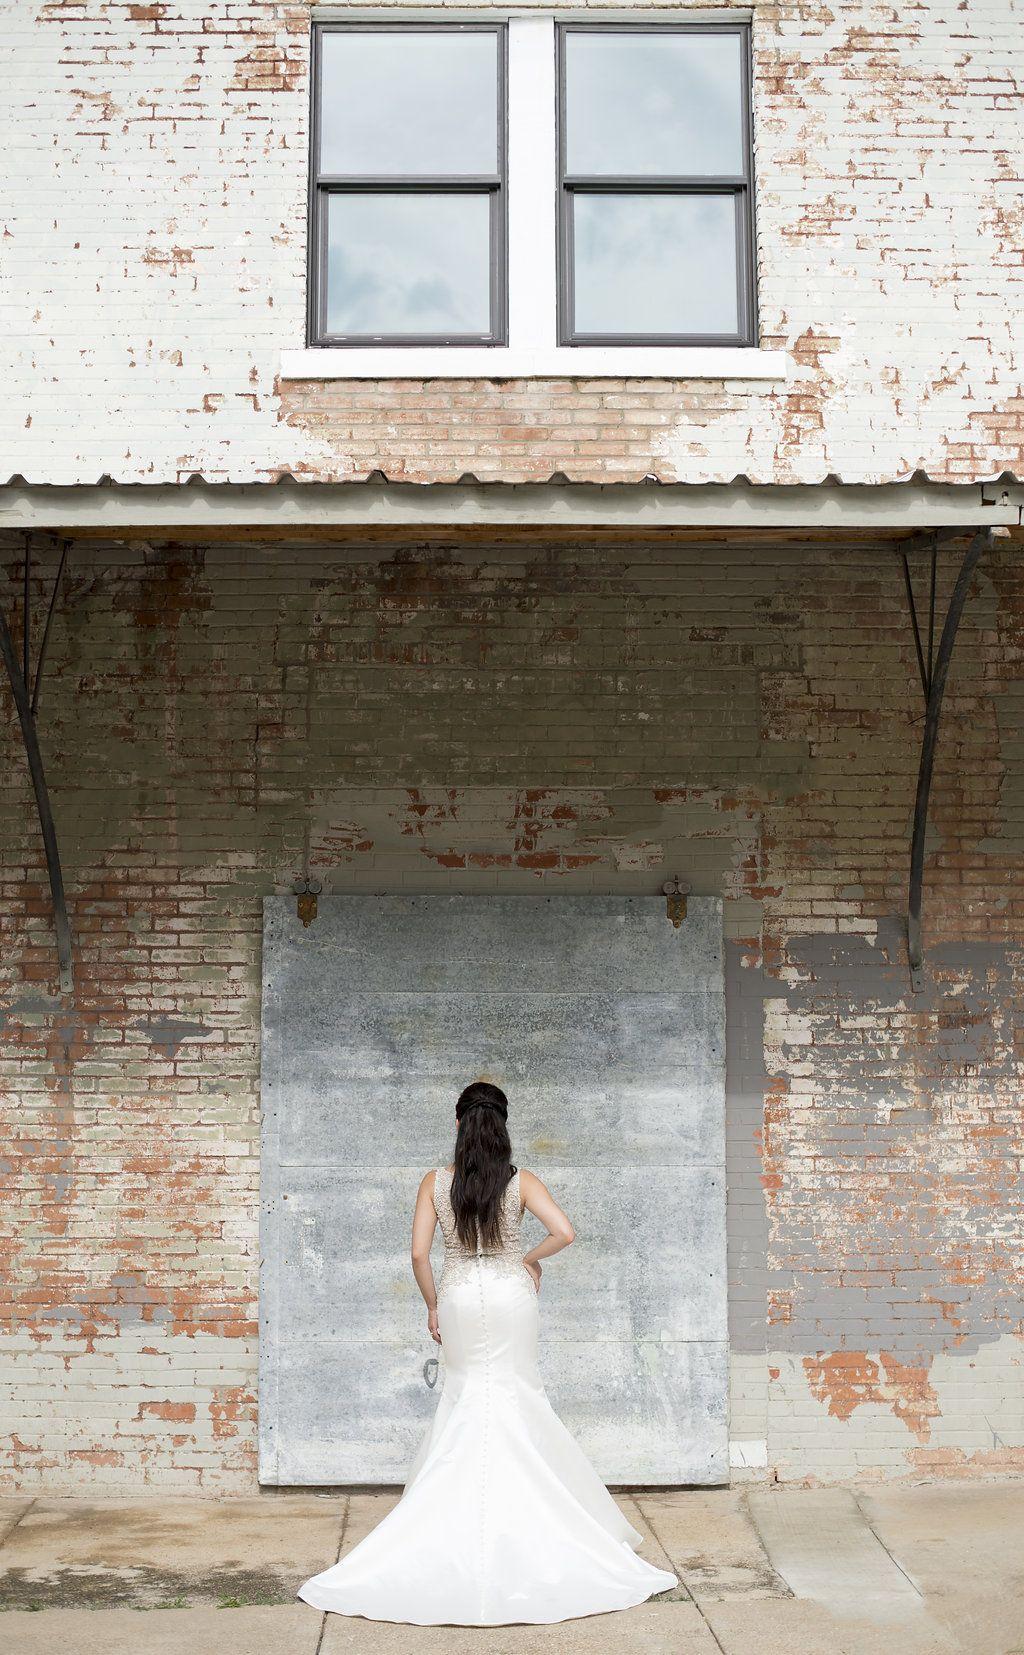 outdoor wedding venues in fort worth tx%0A Modern Editorial   BRIK Venue   Weddings   Events   Fort Worth   Texas    Bridal